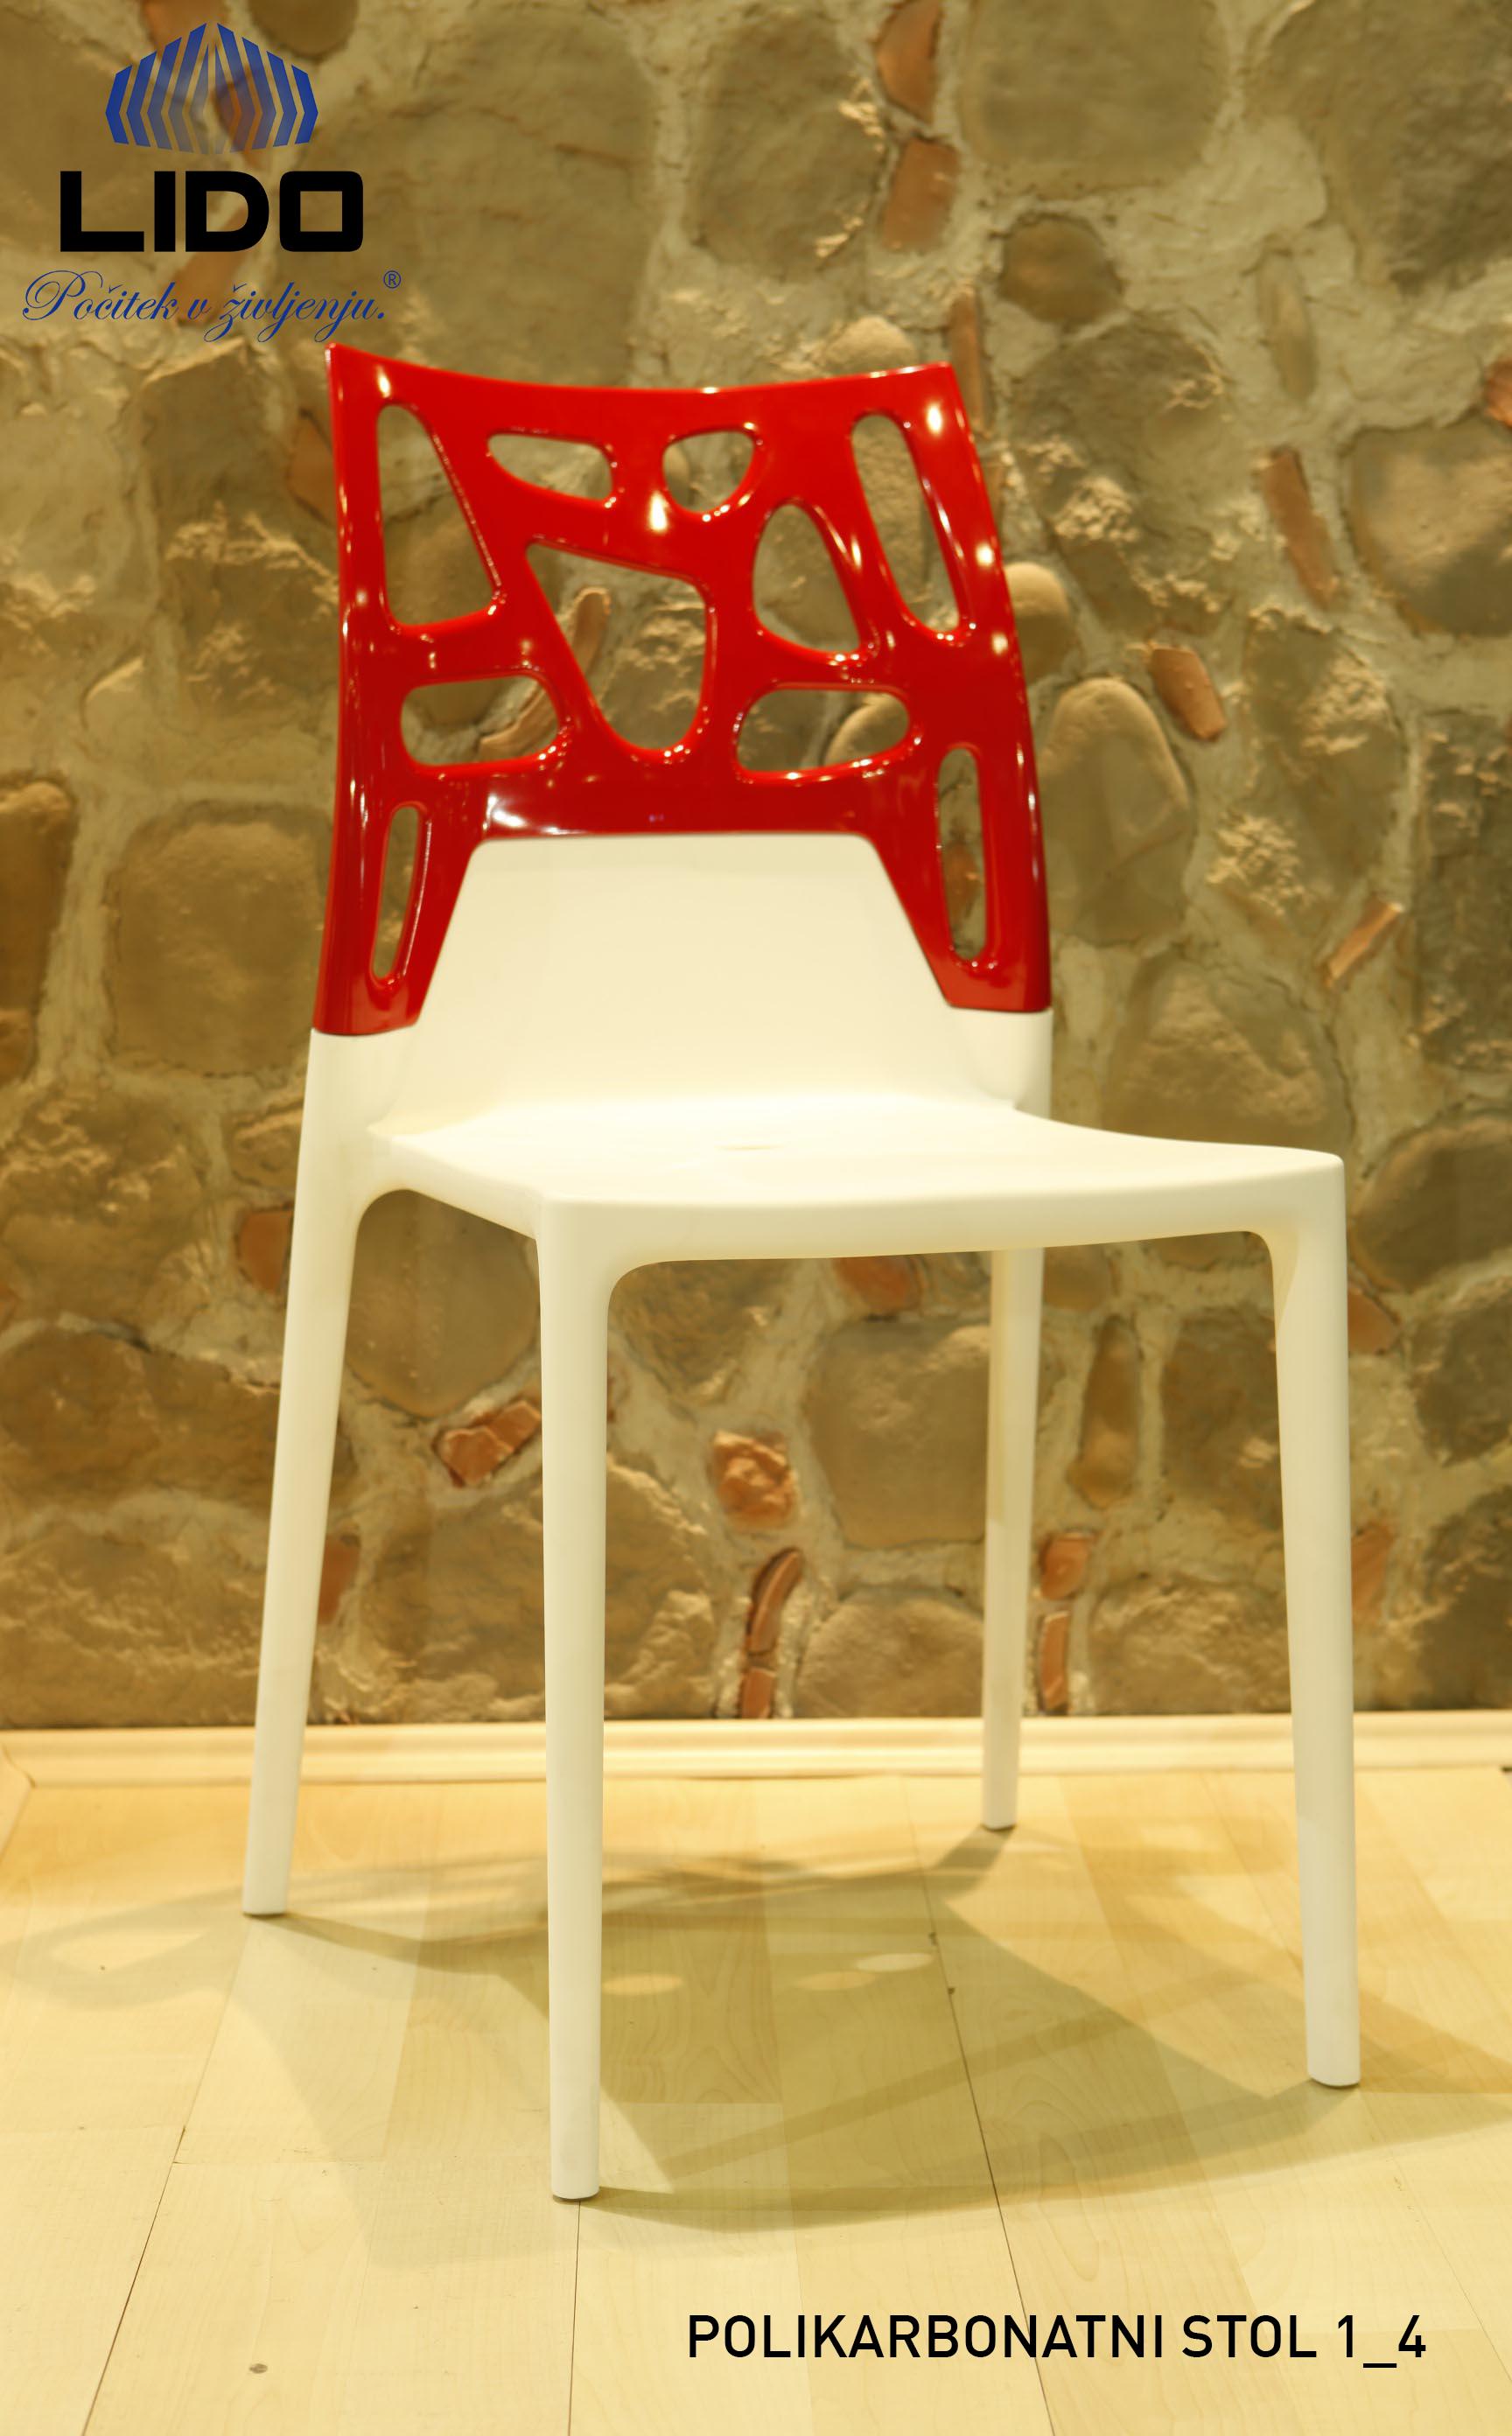 Lido_Polikarbonatni stol 1_4